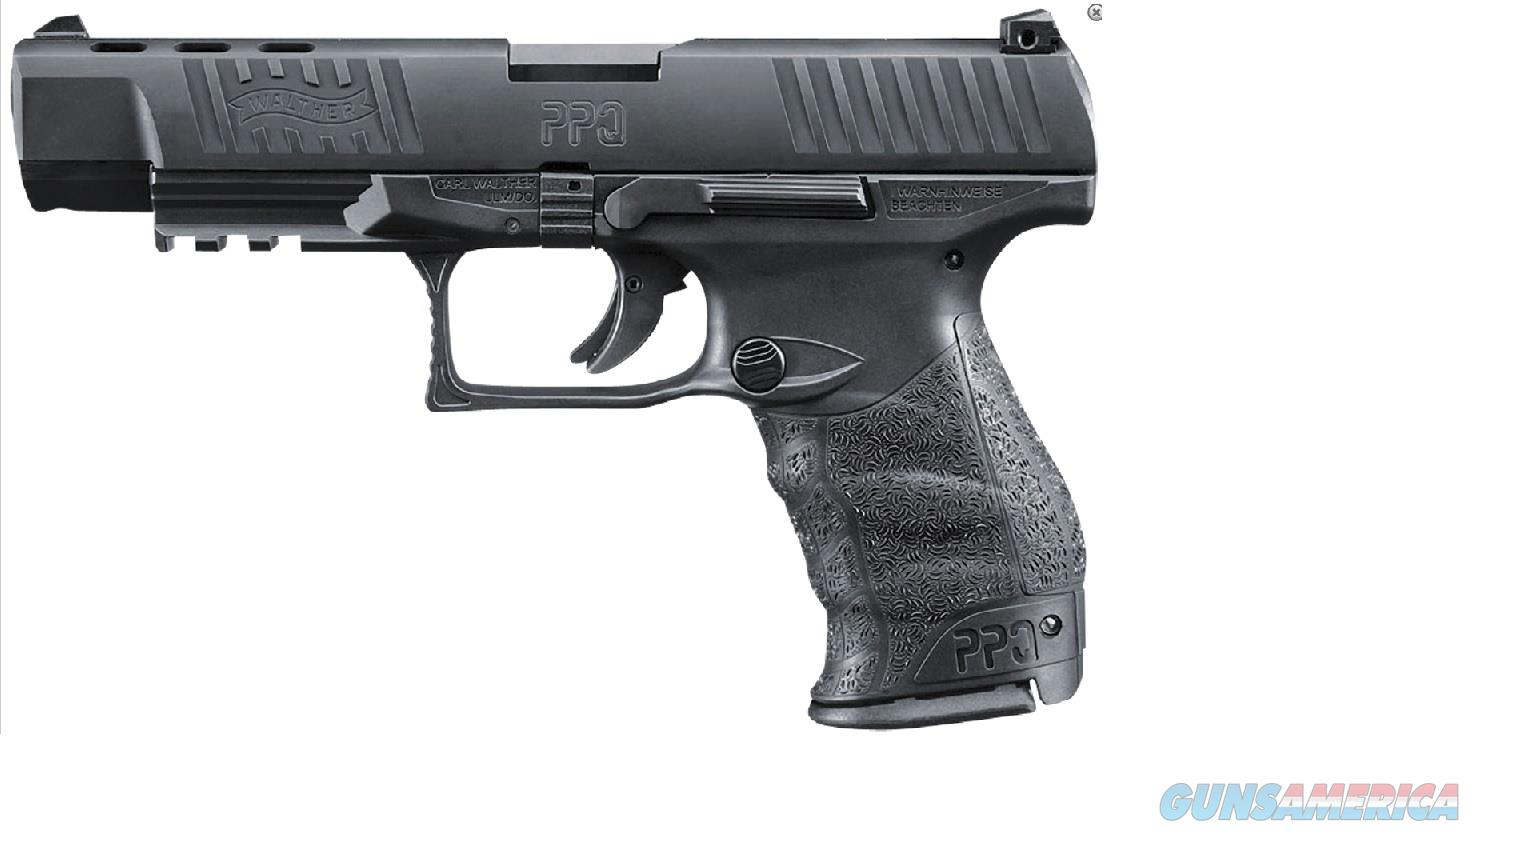 "2796091 Walther PPQ M2 - 5""  9mm  Guns > Pistols > Walther Pistols > Post WWII > P99/PPQ"